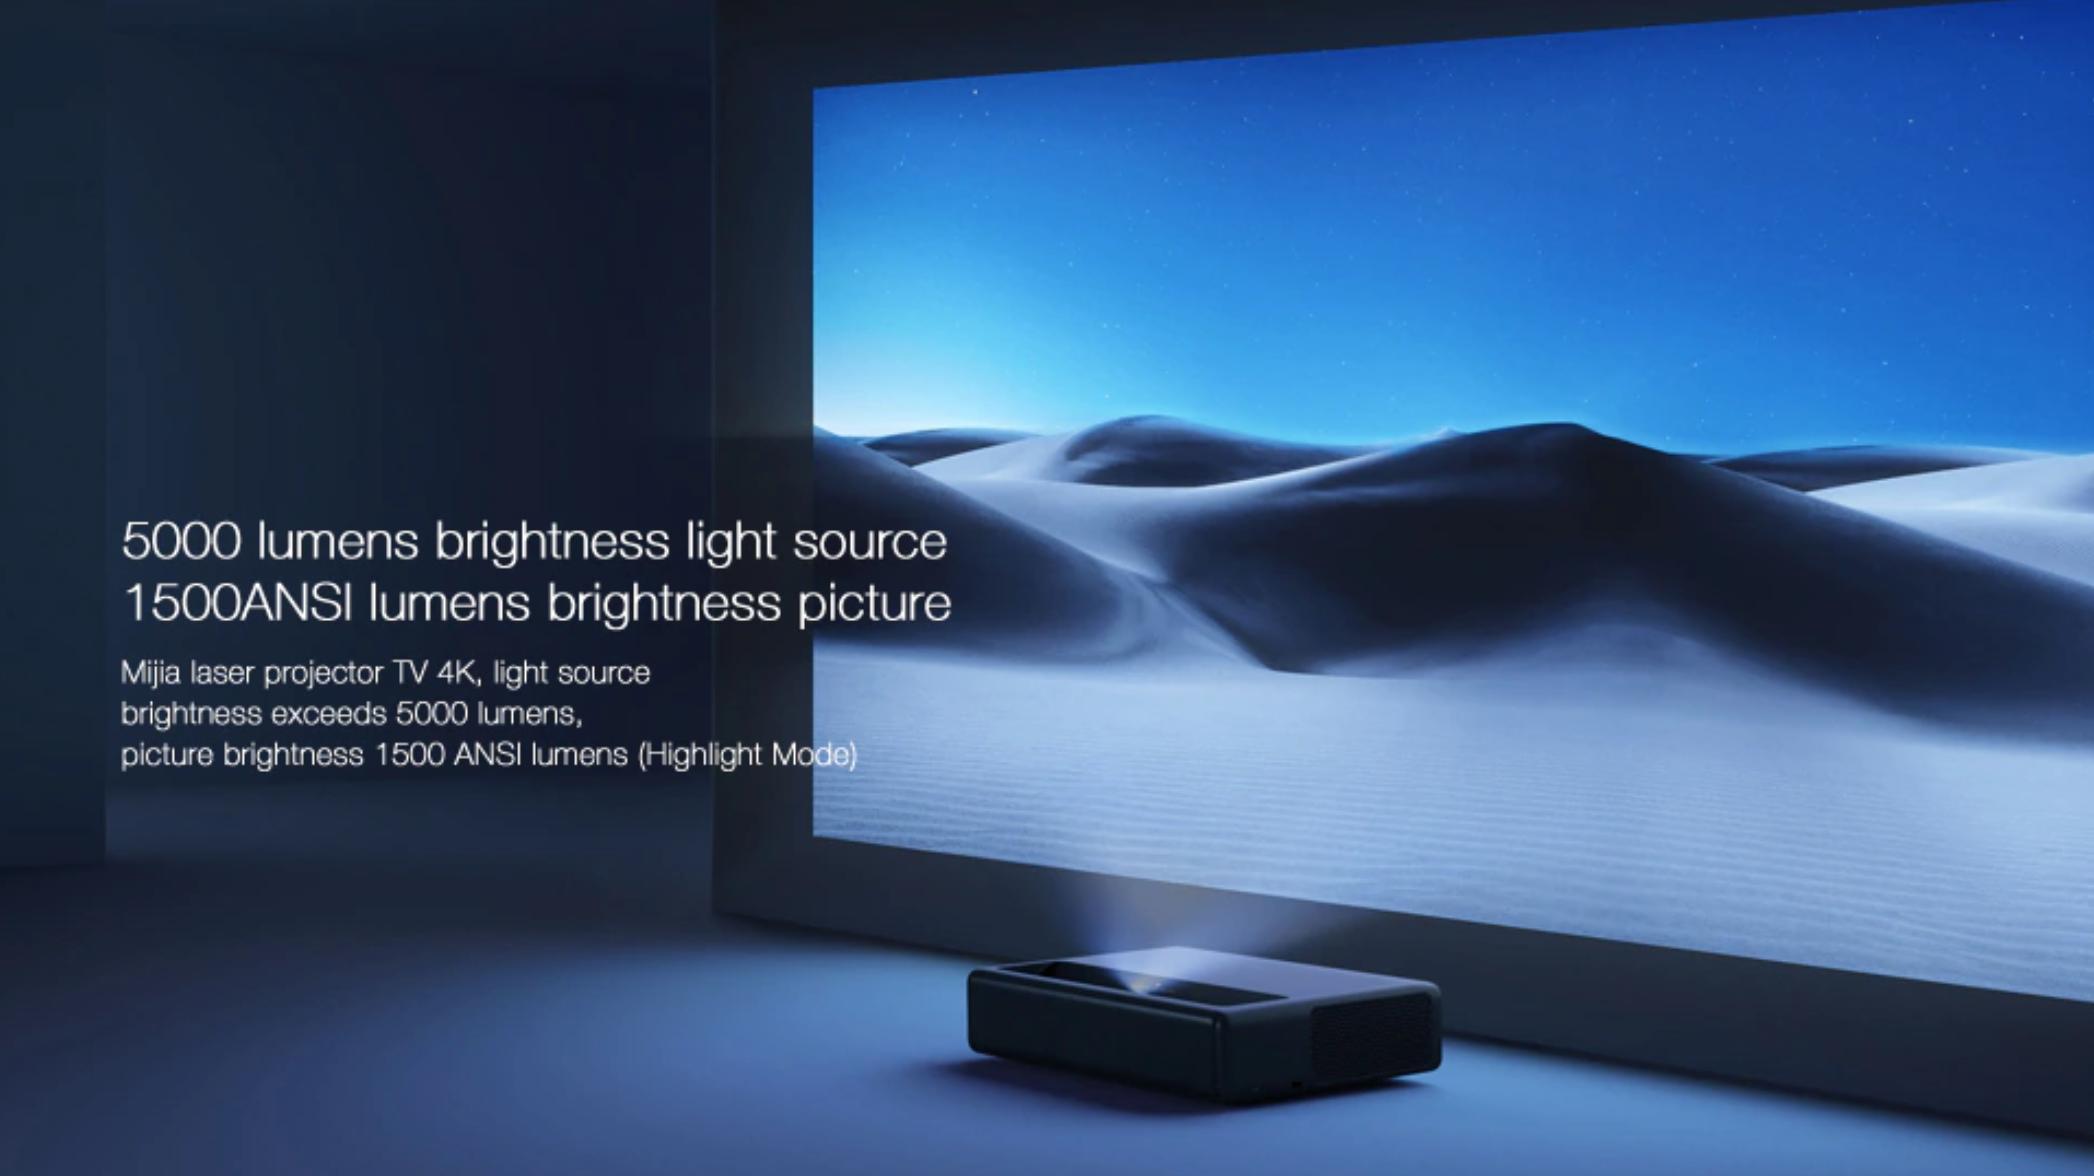 xiaomi 4k projector